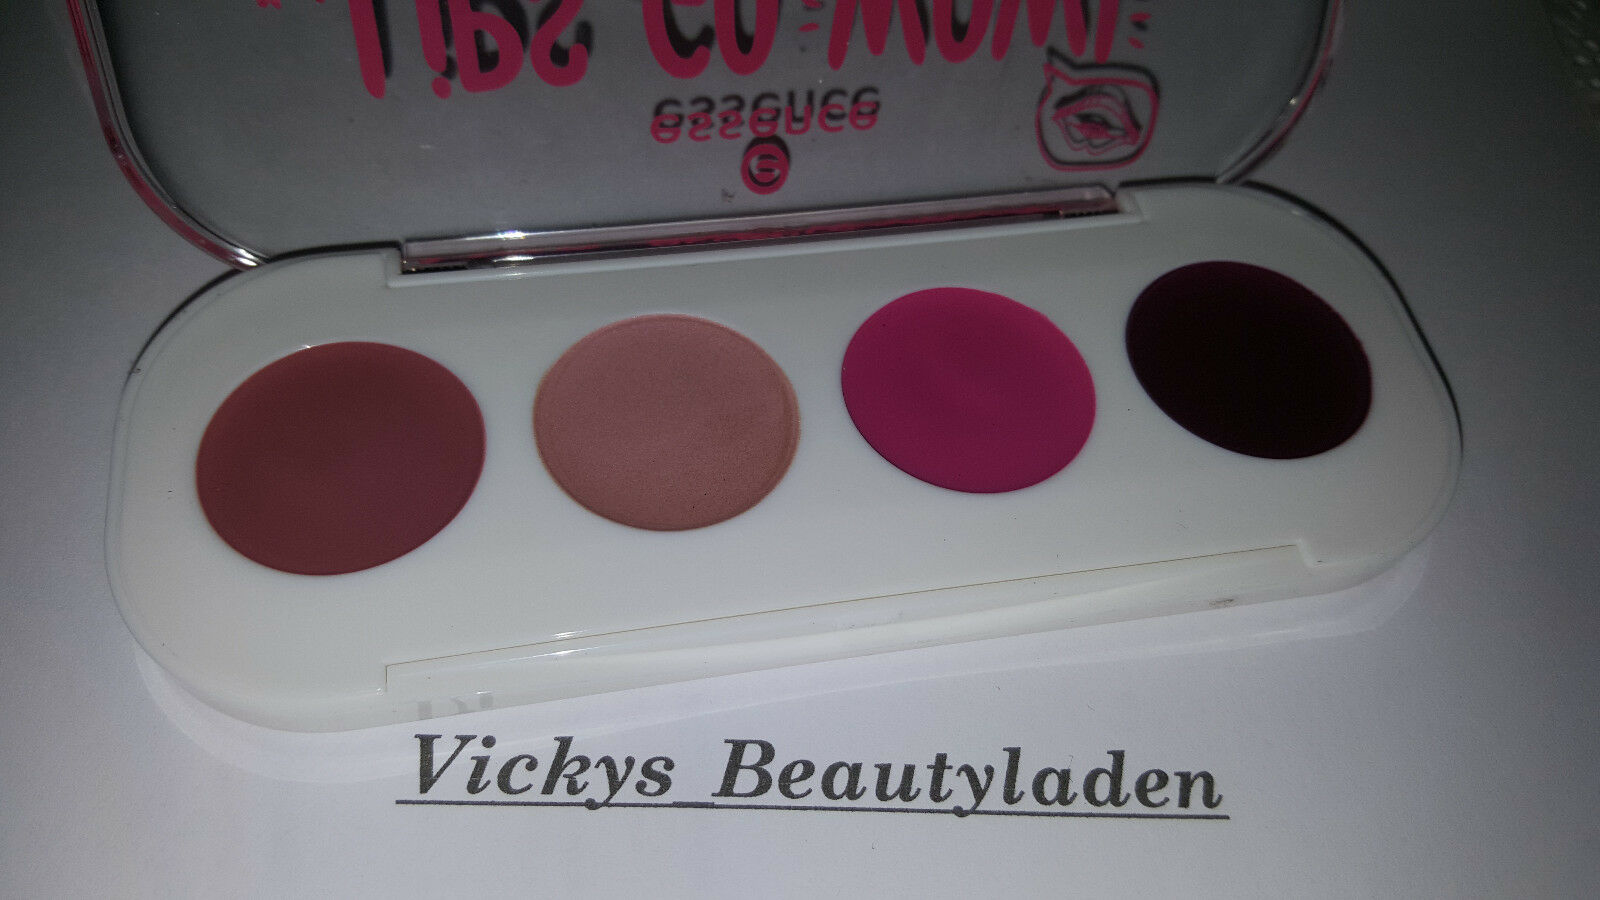 Essence Lips Go Wow Lip Art Palette 02 Be an Artist Creme to Powder Lippenstift